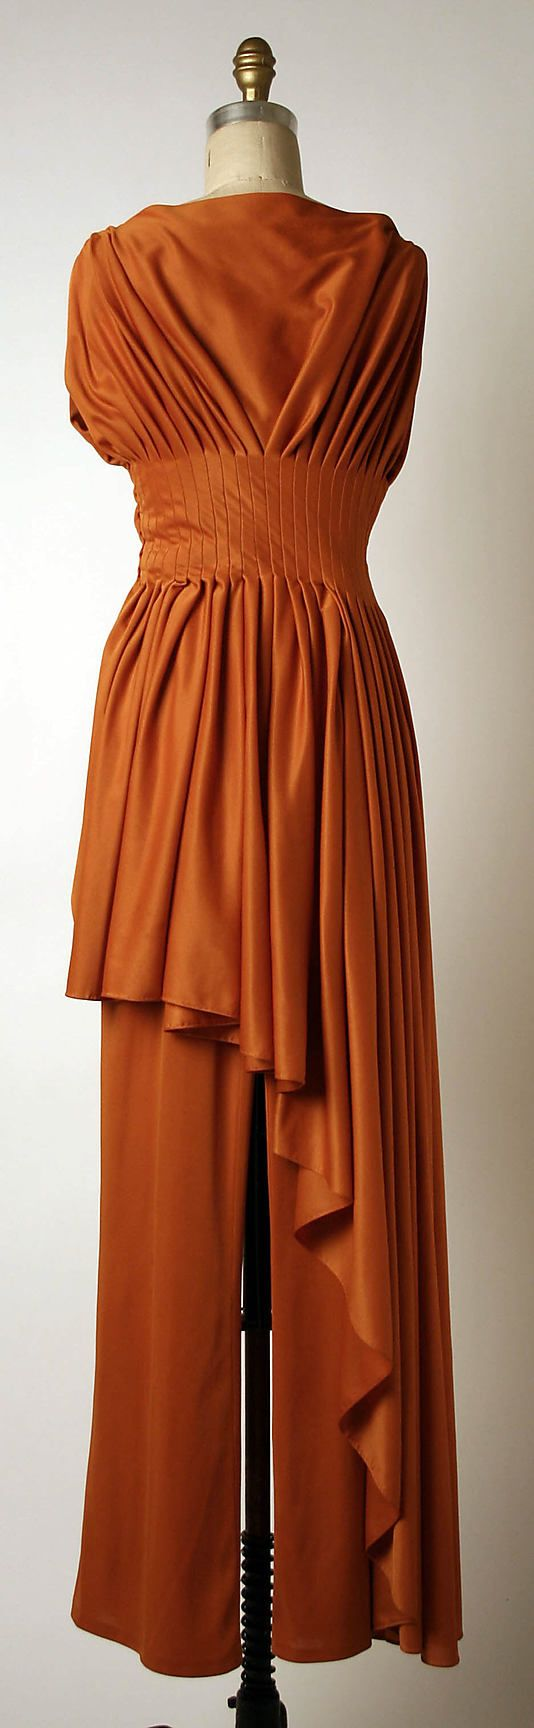 Evening pantsuit Madame Grès (Alix Barton)  (French, Paris 1903–1993 Var region)  Date: ca. 1975 Culture: French Medium: silk. Back